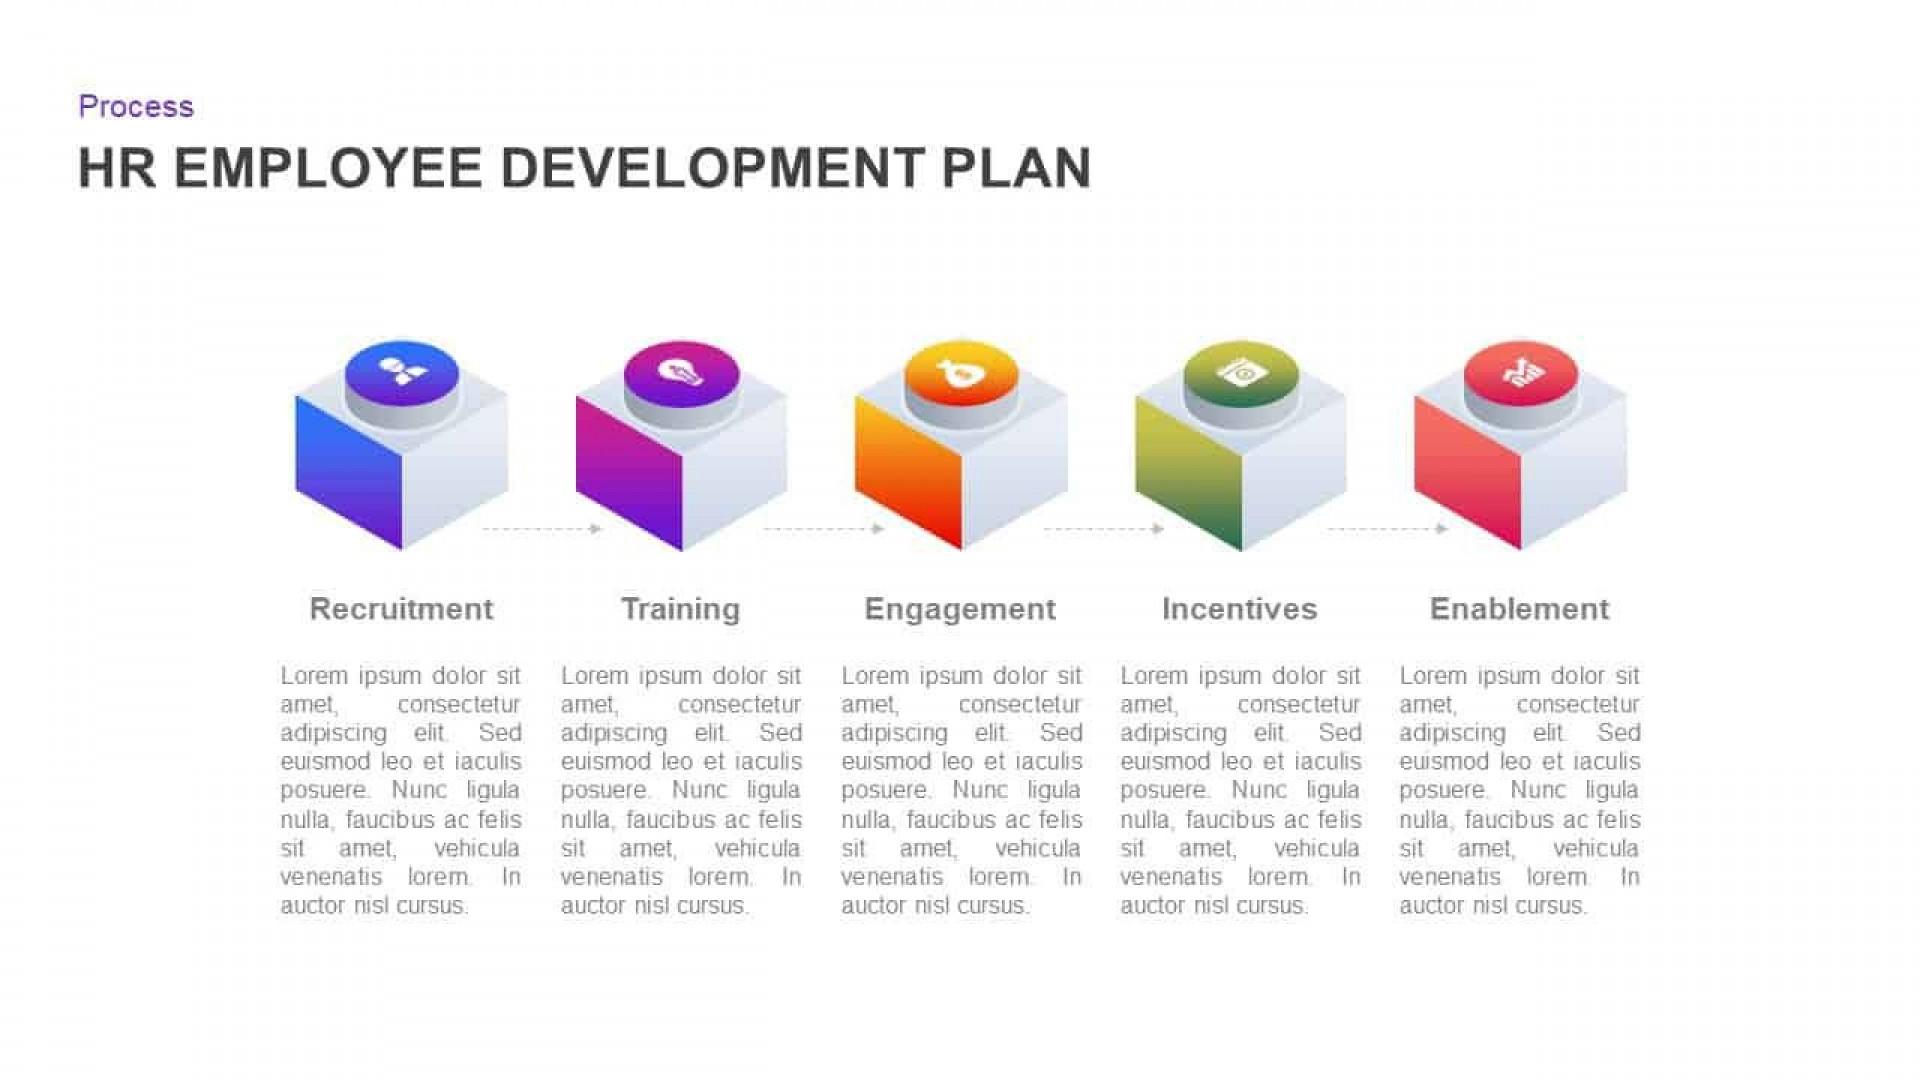 005 Wonderful Employee Development Plan Template Highest Quality  Ppt Free1920